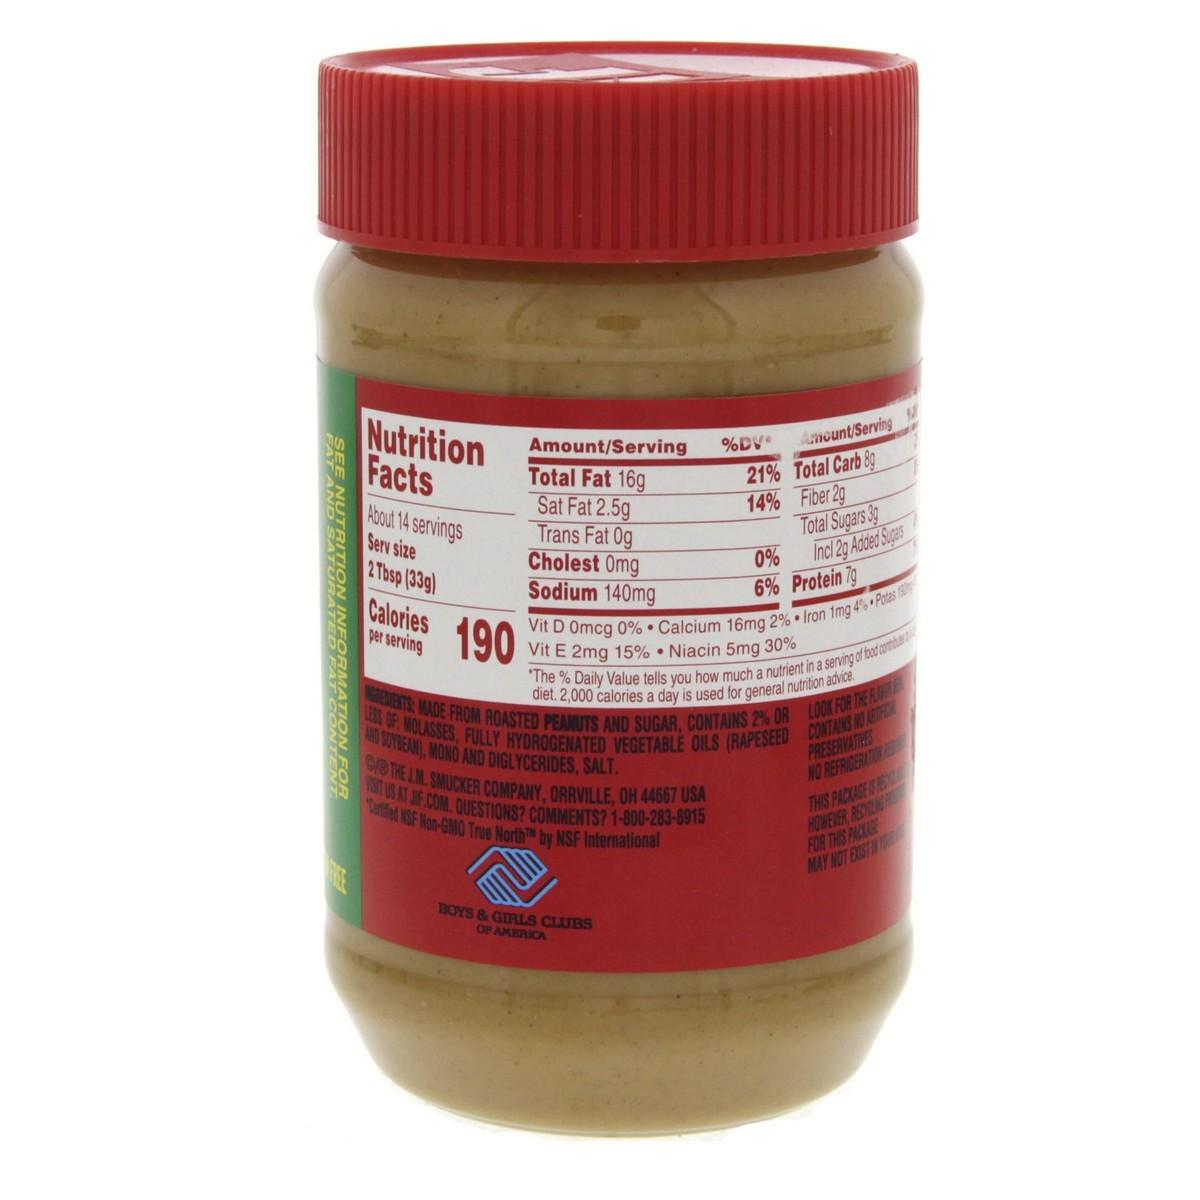 Buy Jif Creamy Peanut Butter 454g